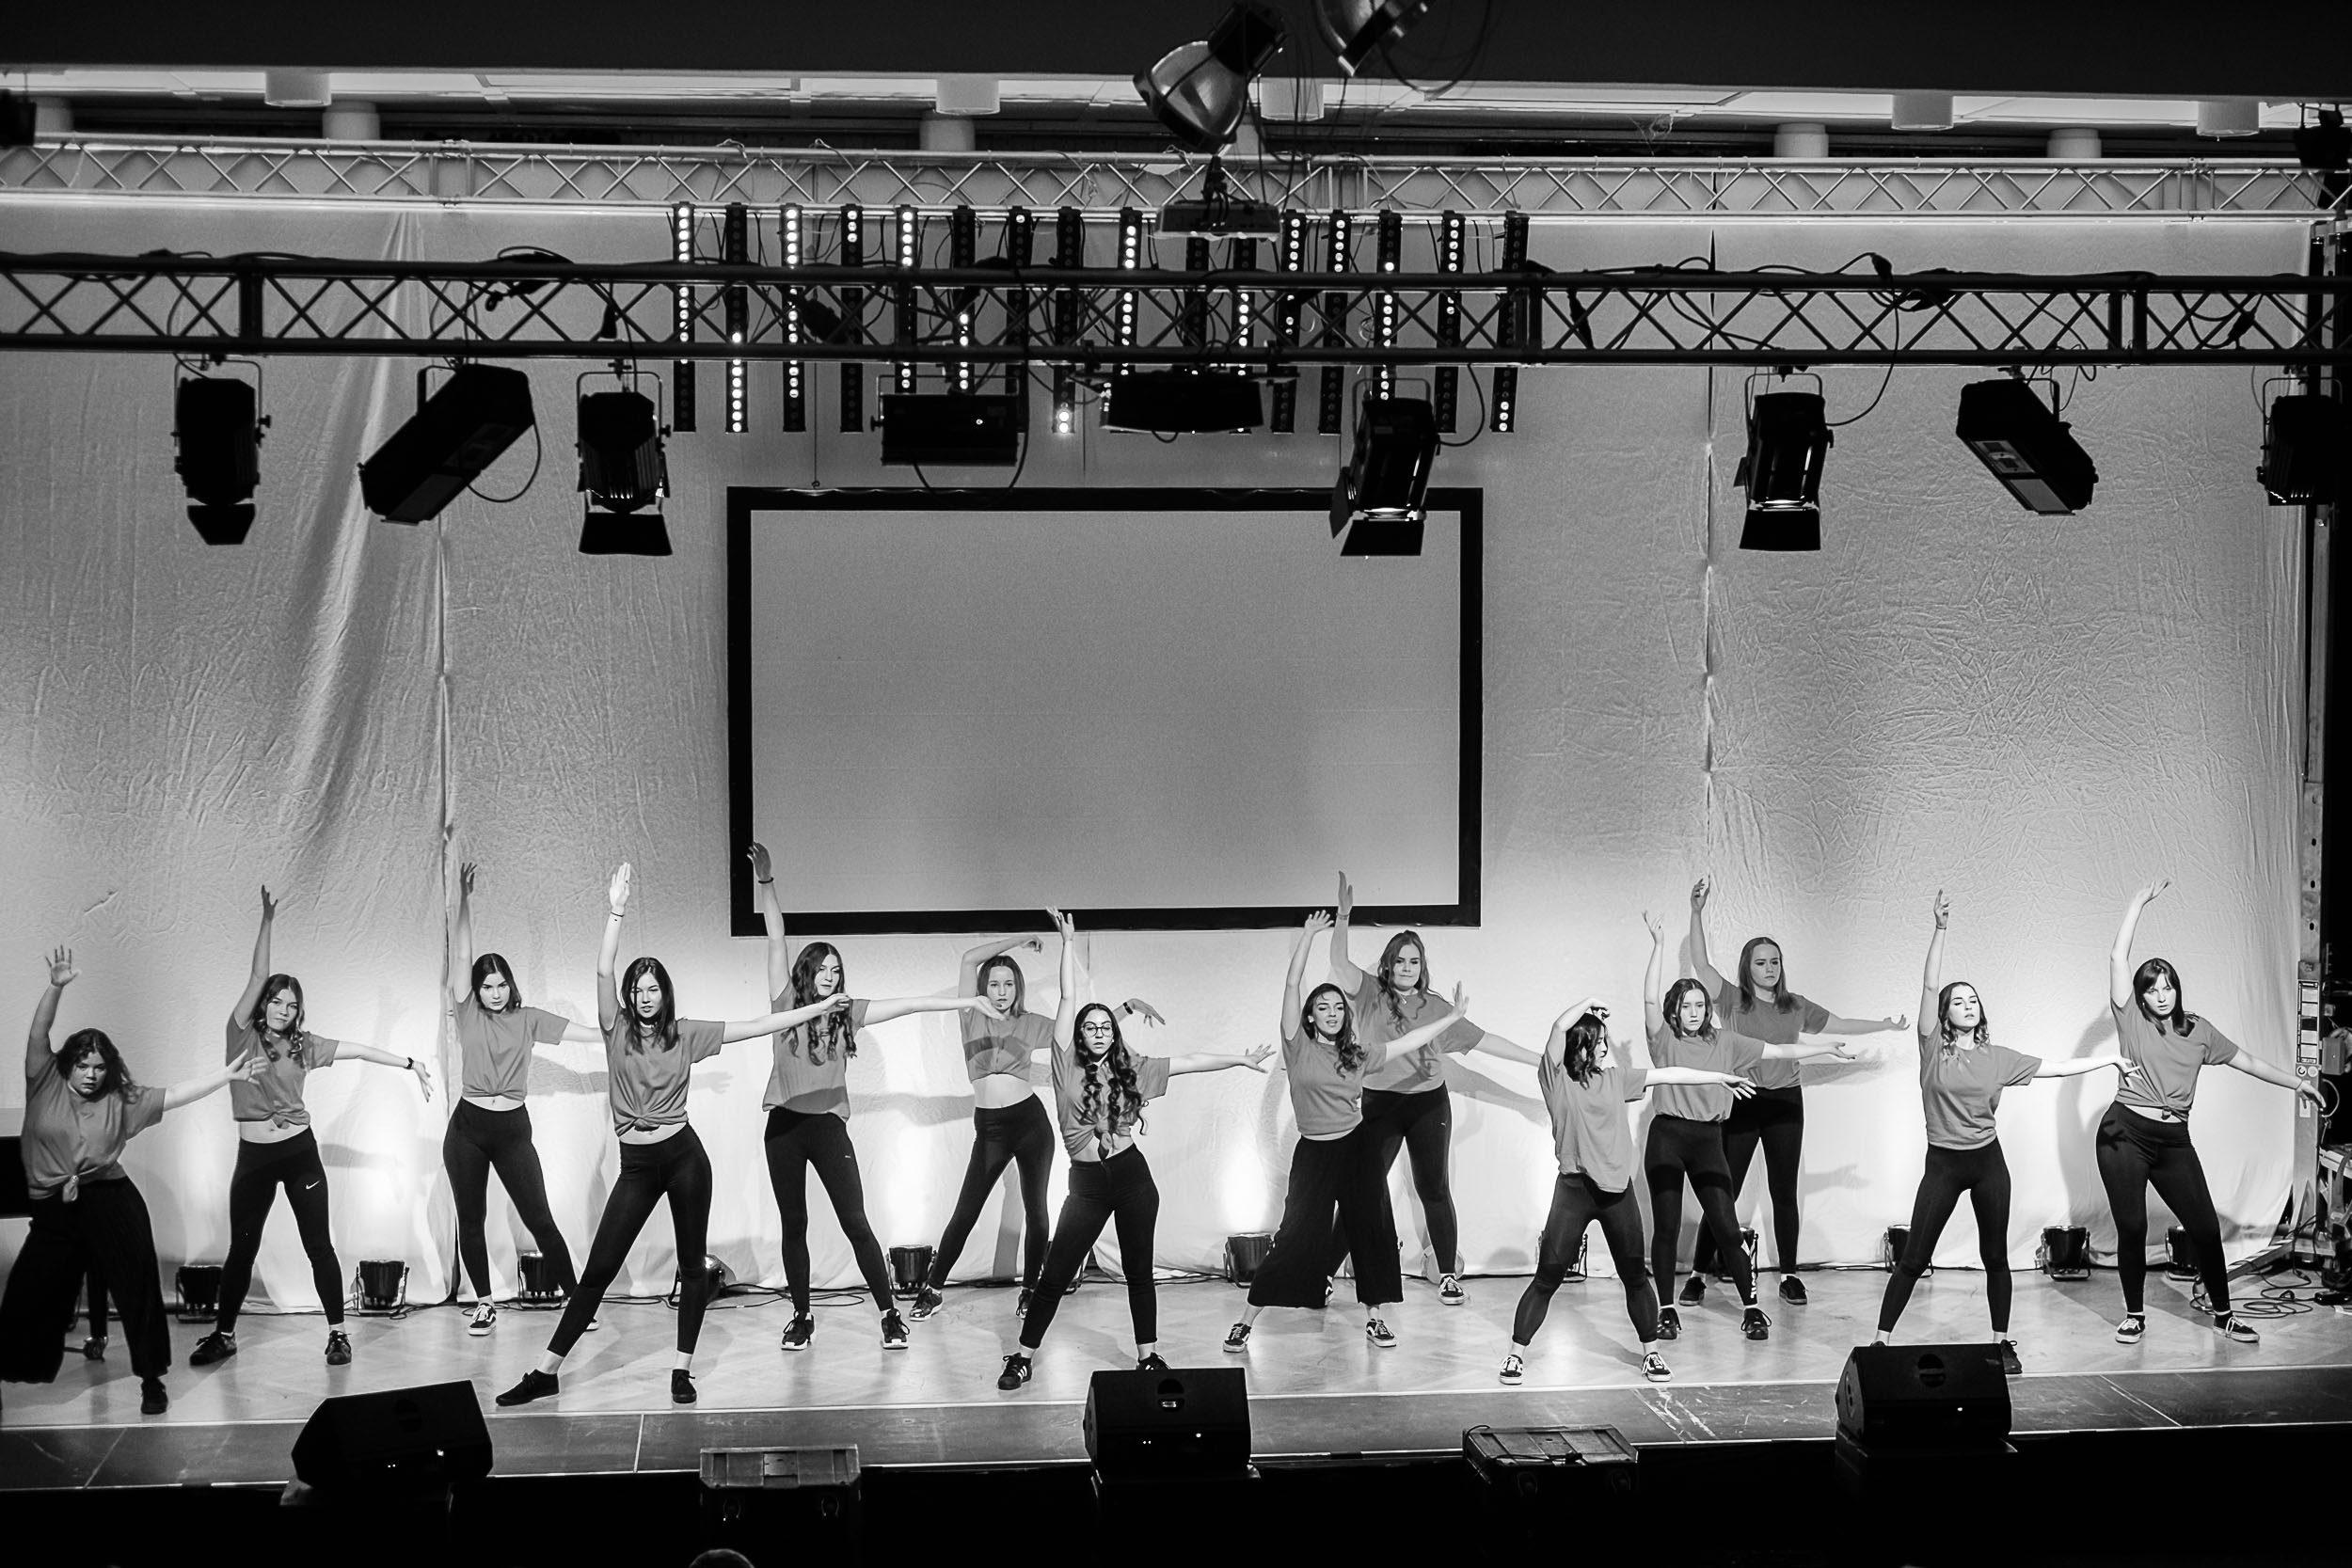 Tanzperformance Varieté Q1 Wesergymnasium Vlotho WGV 2019